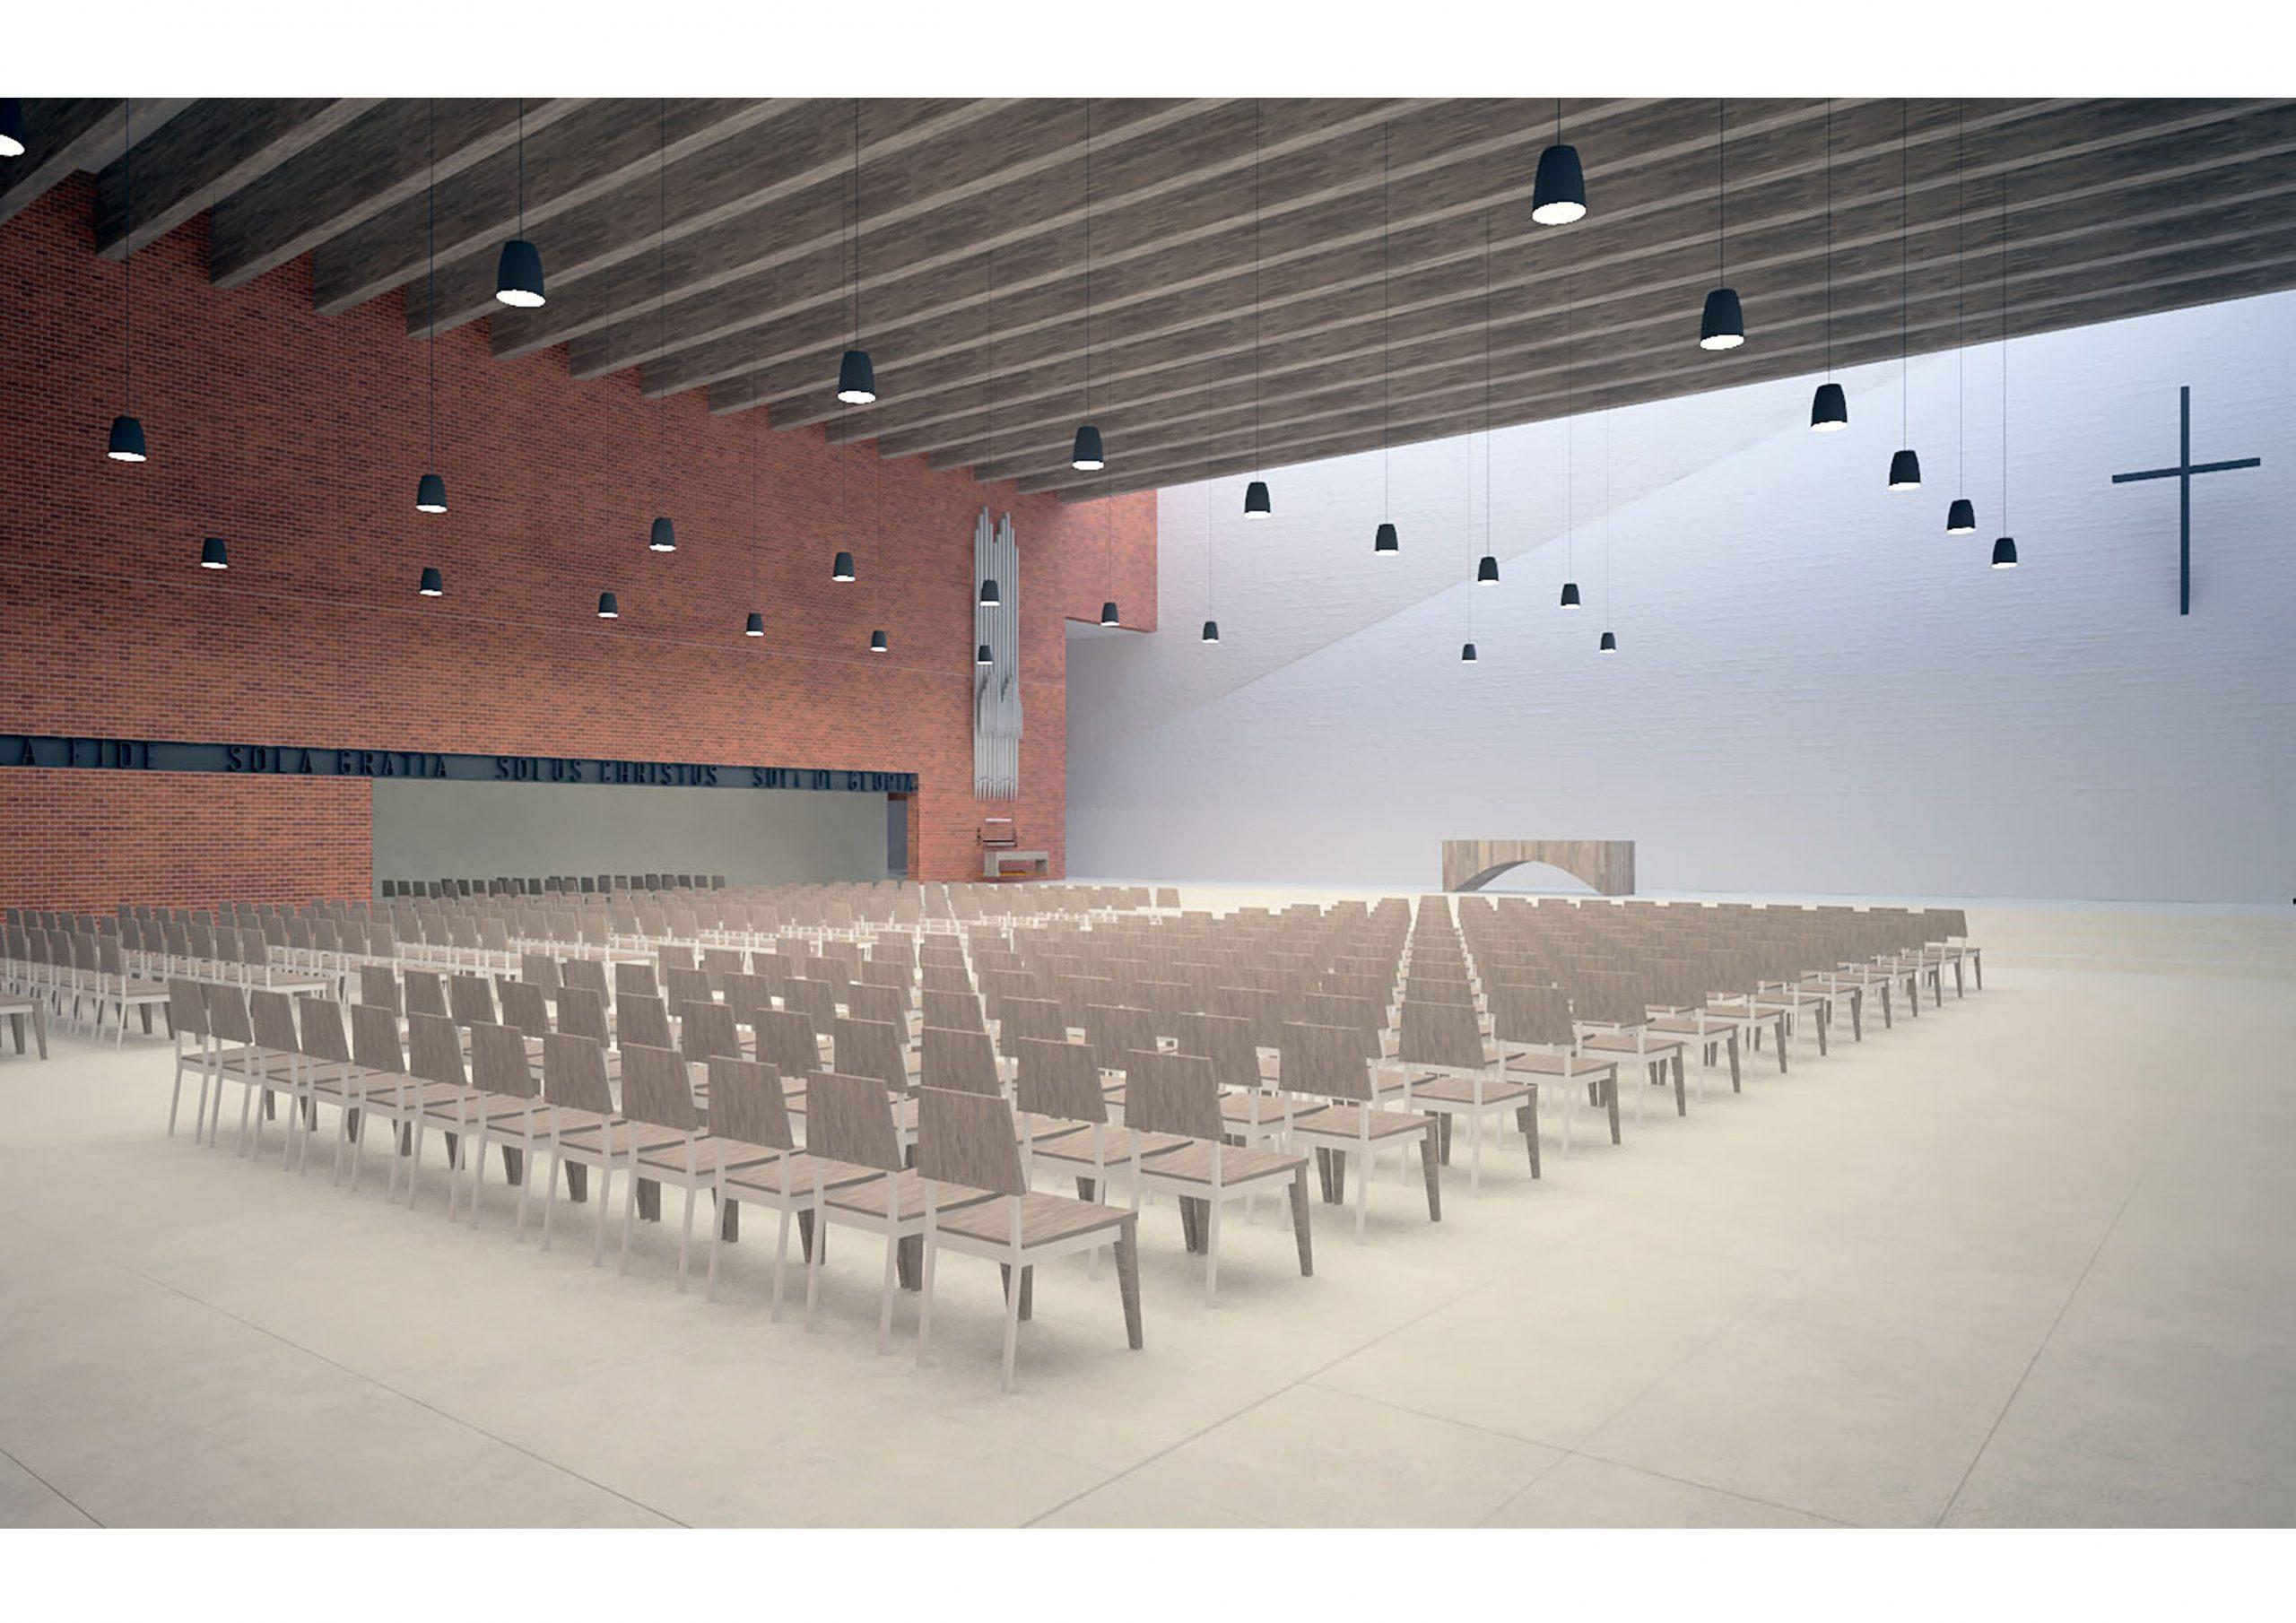 https://nbc-arhitect.ro/wp-content/uploads/2020/10/NBC-Arhitect-_-public-buildings-_-Protestant-Church-_-Copenhagen-_-interior-view_5-scaled.jpg